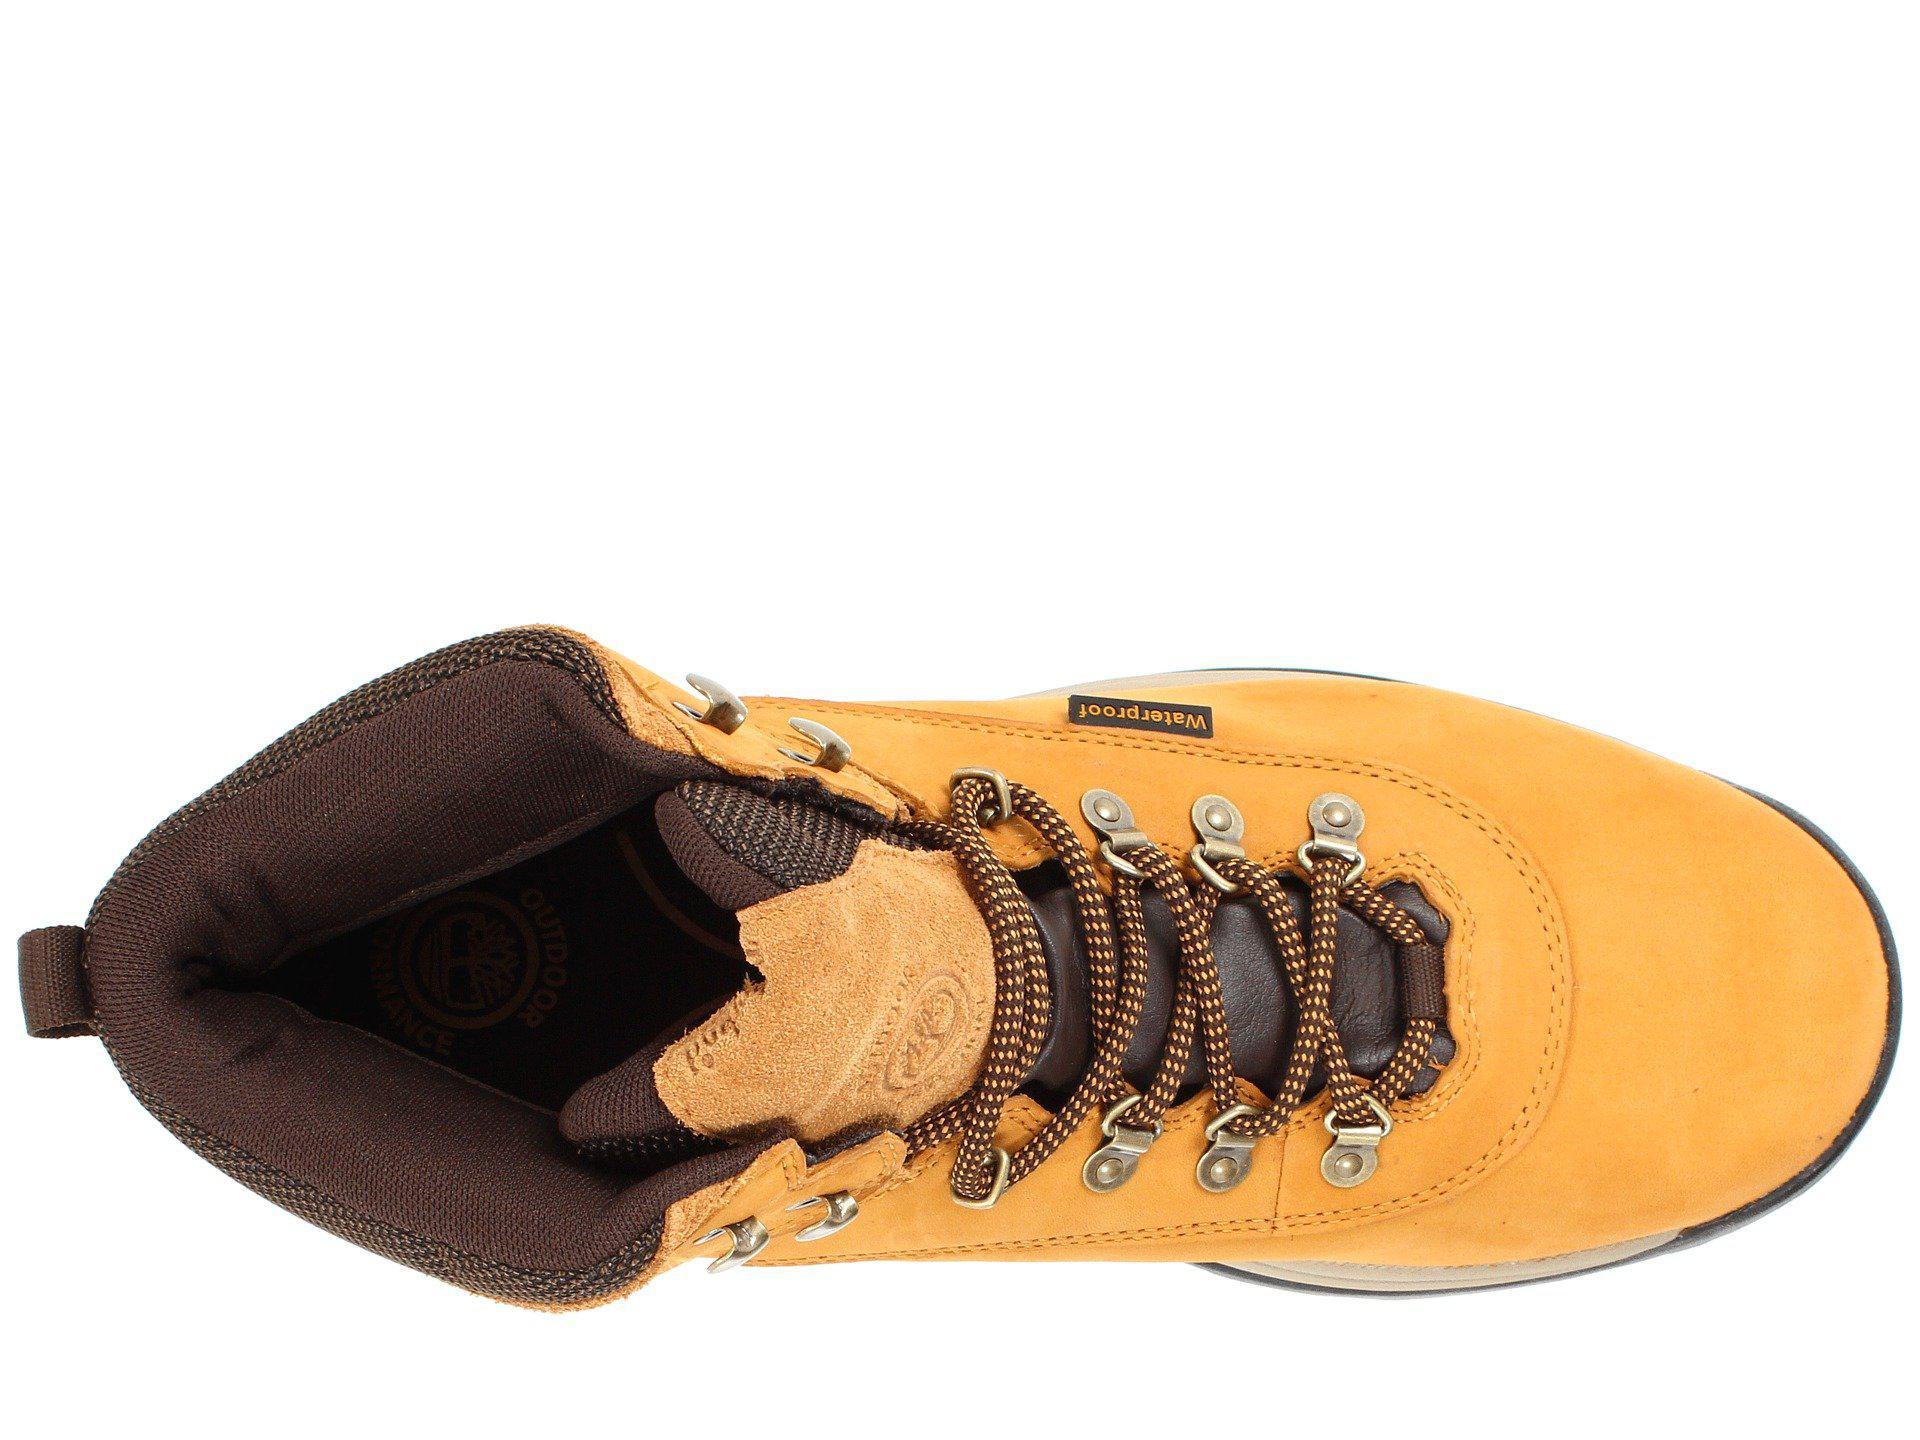 afa13346e5e Natural White Ledge Mid Waterproof (brown) Men's Hiking Boots